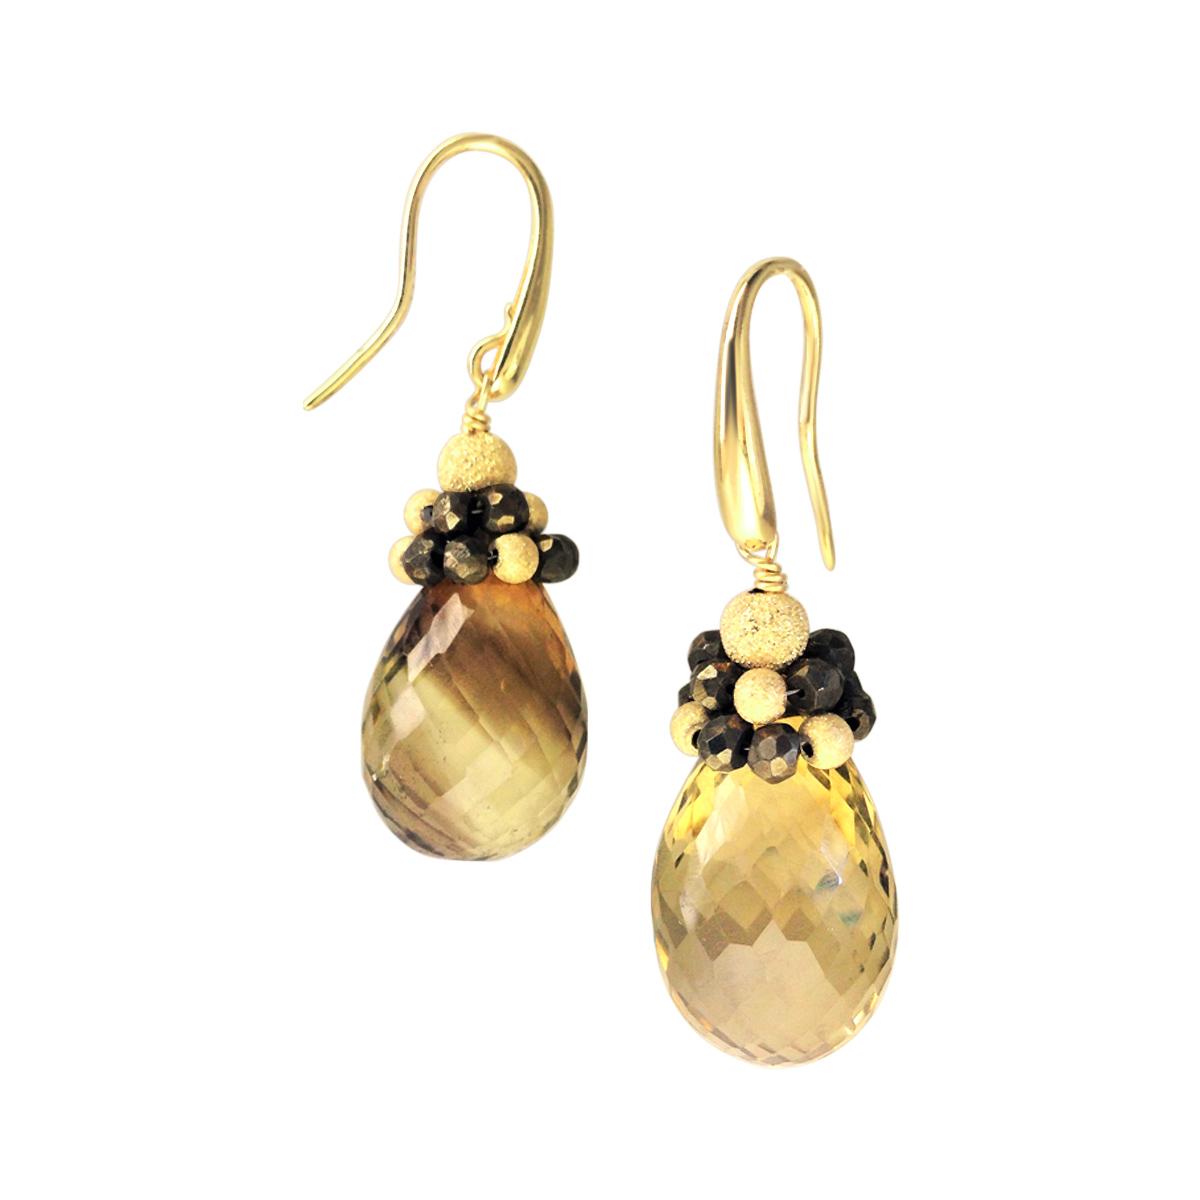 Smoky quartz 18ct gold earrings